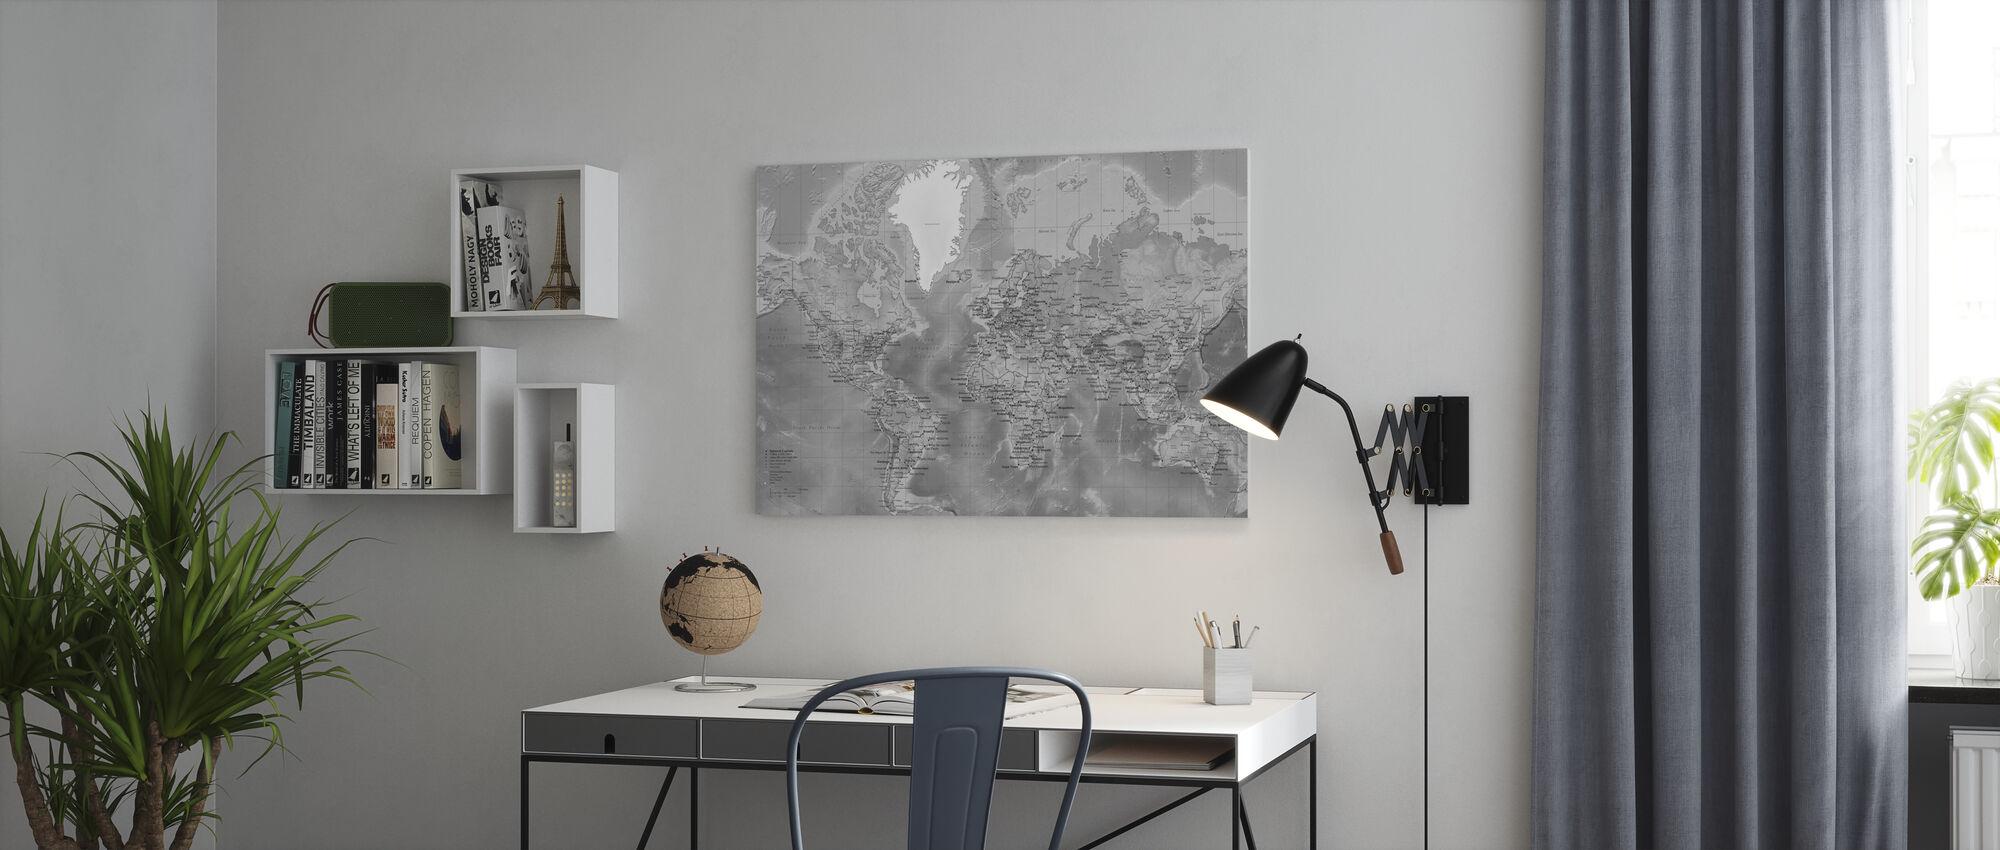 Weltkarte - Detailliert mit Straßen - Grau - Leinwandbild - Büro